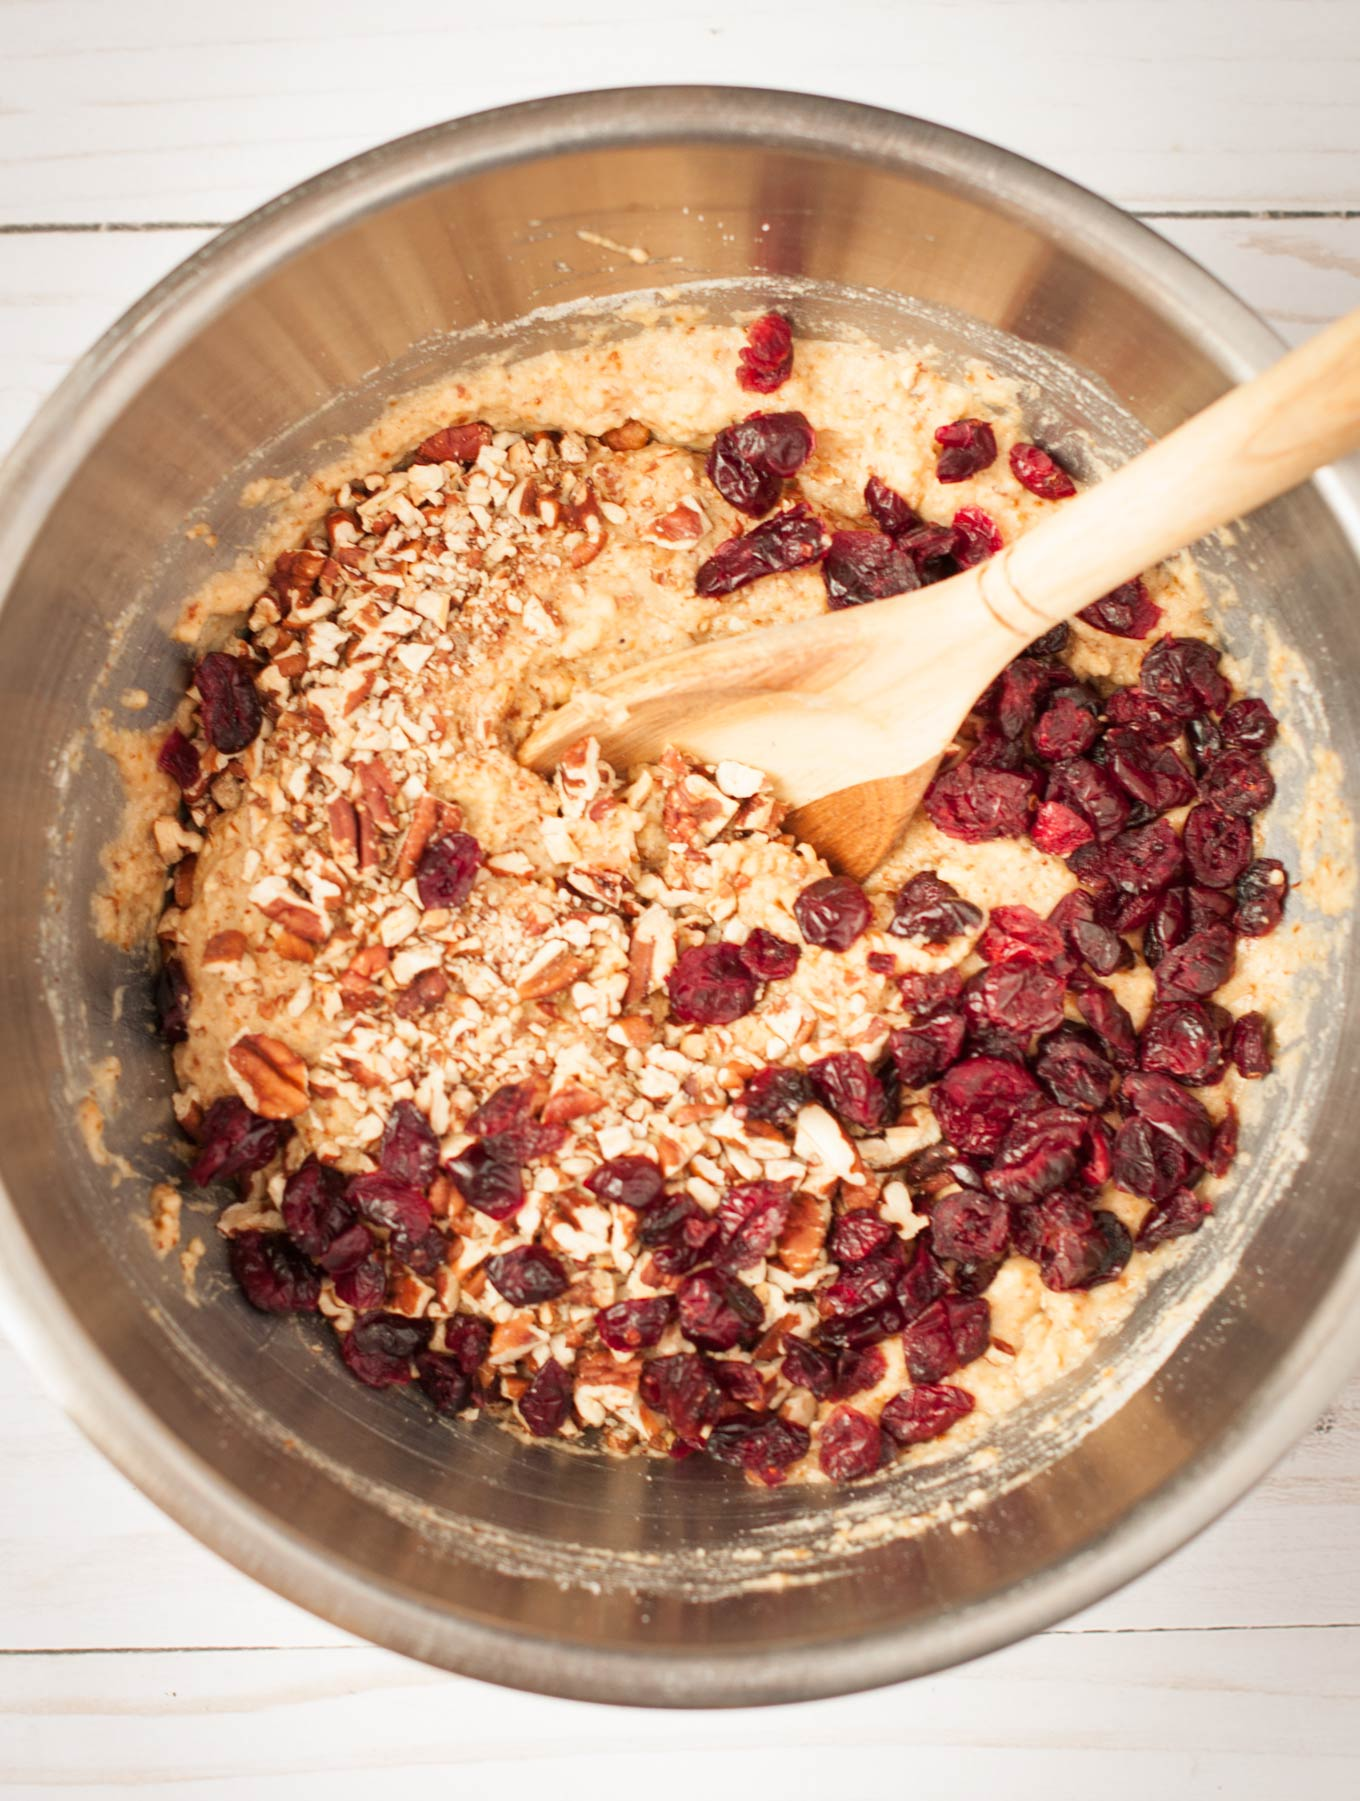 Gluten Free Cranberry Cardamon Scones Batter